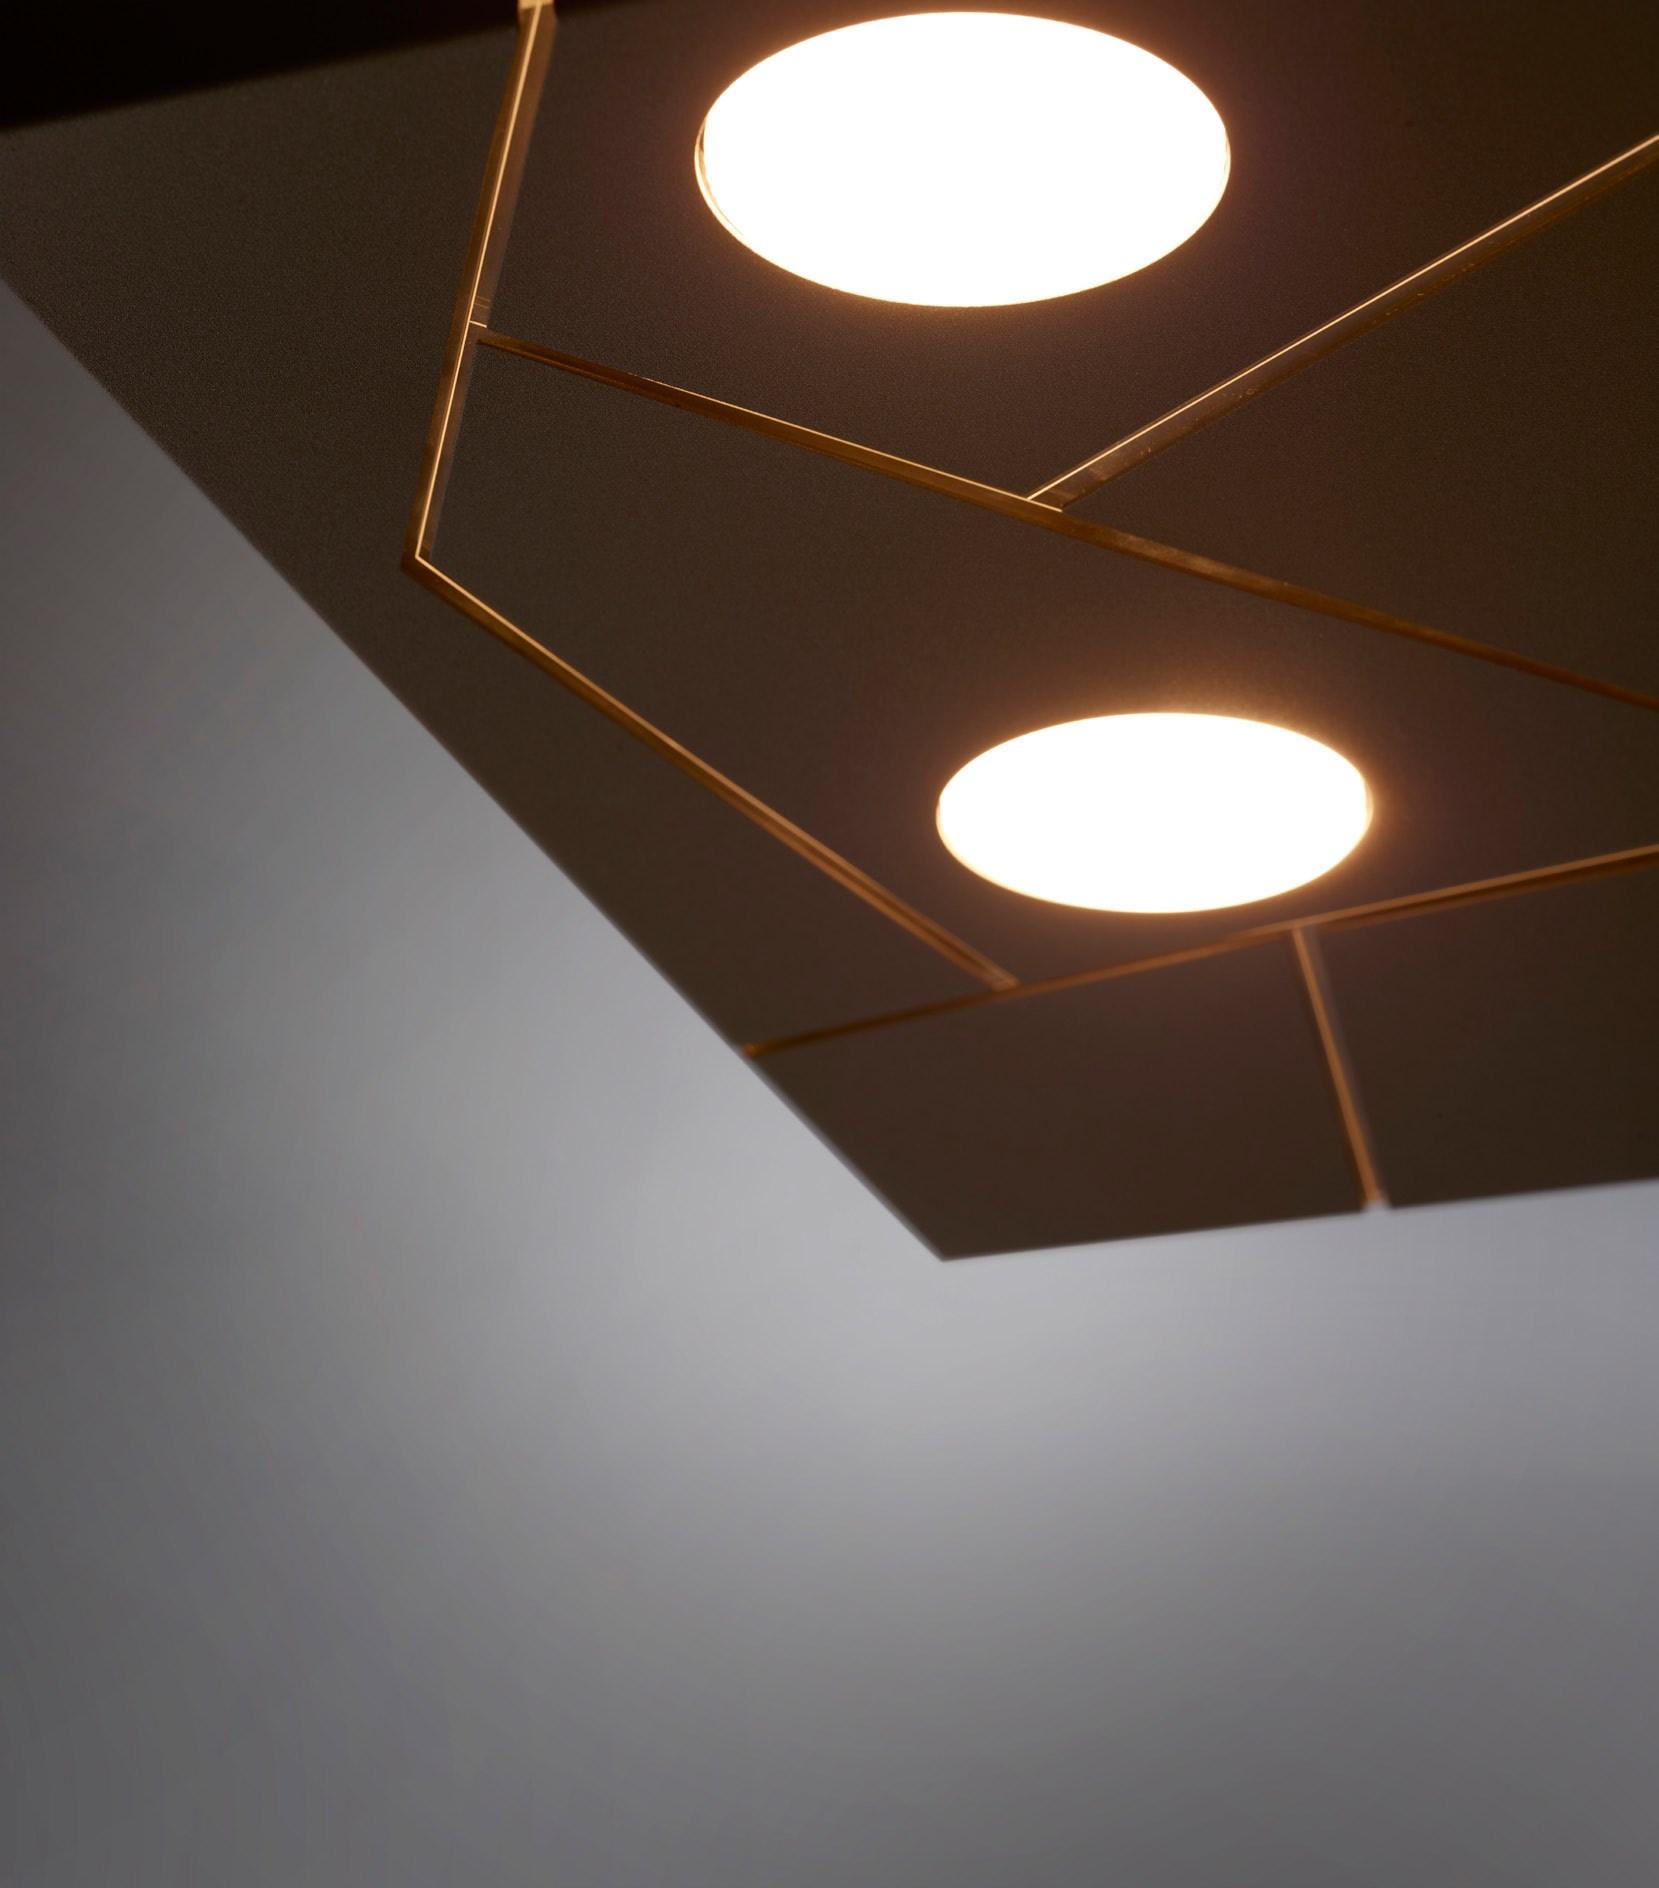 STREET Wall Lamp Cattaneo Illuminazione 336734 Rel2cfc55ba